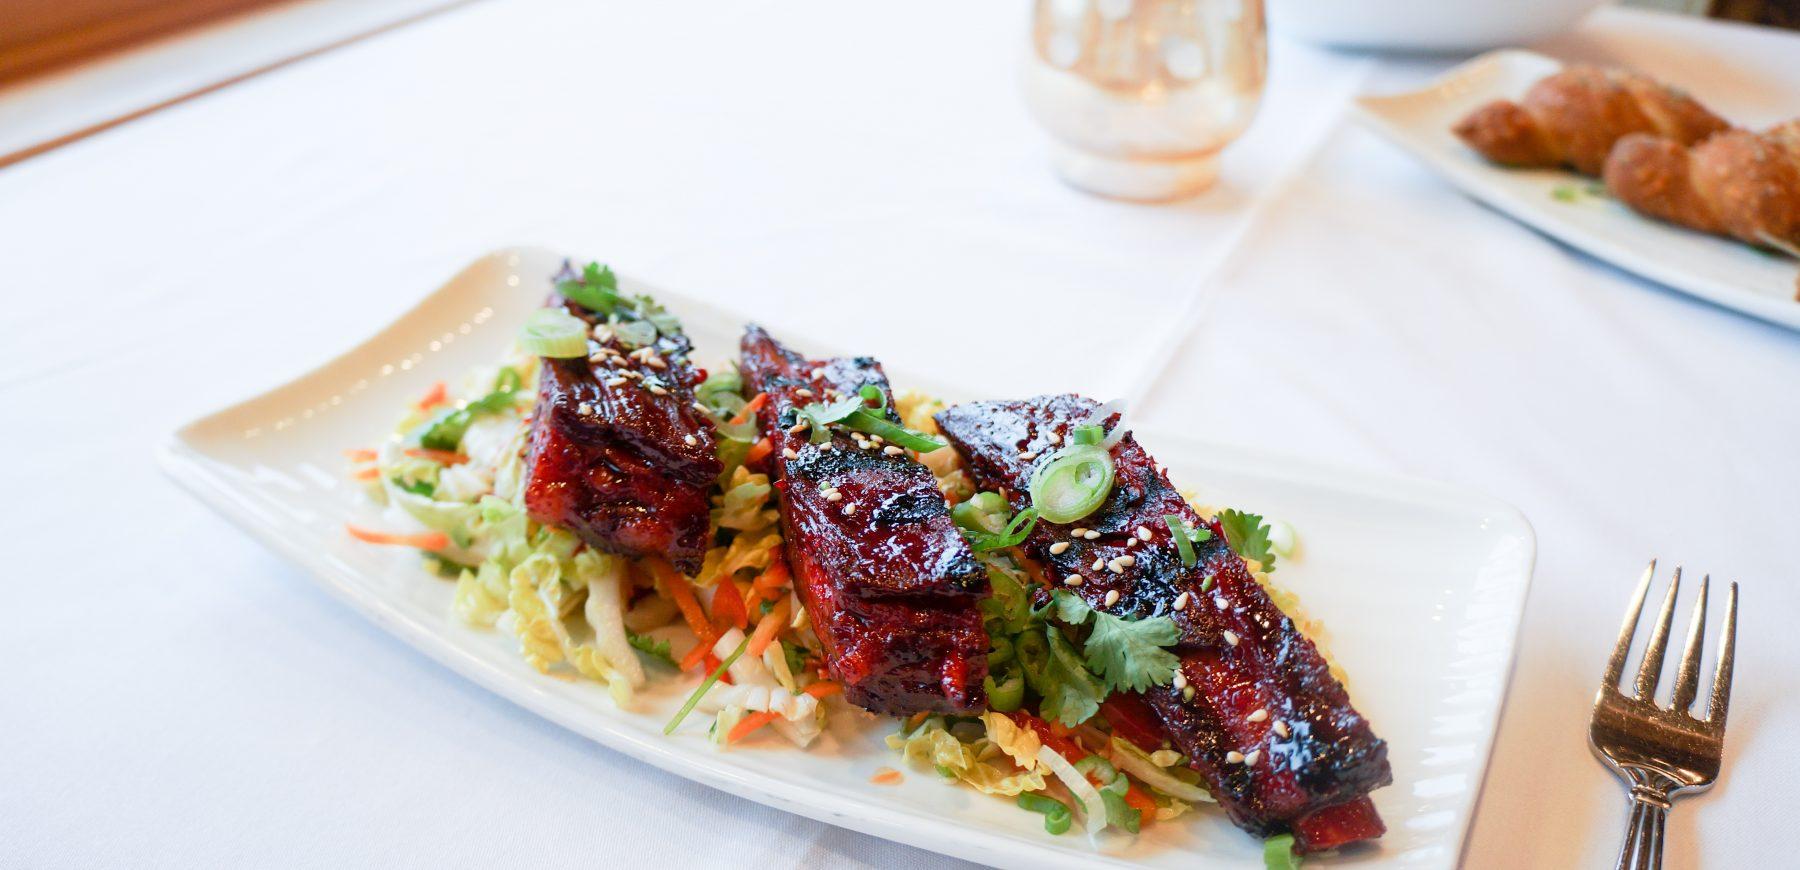 plate of char siu pork ribs